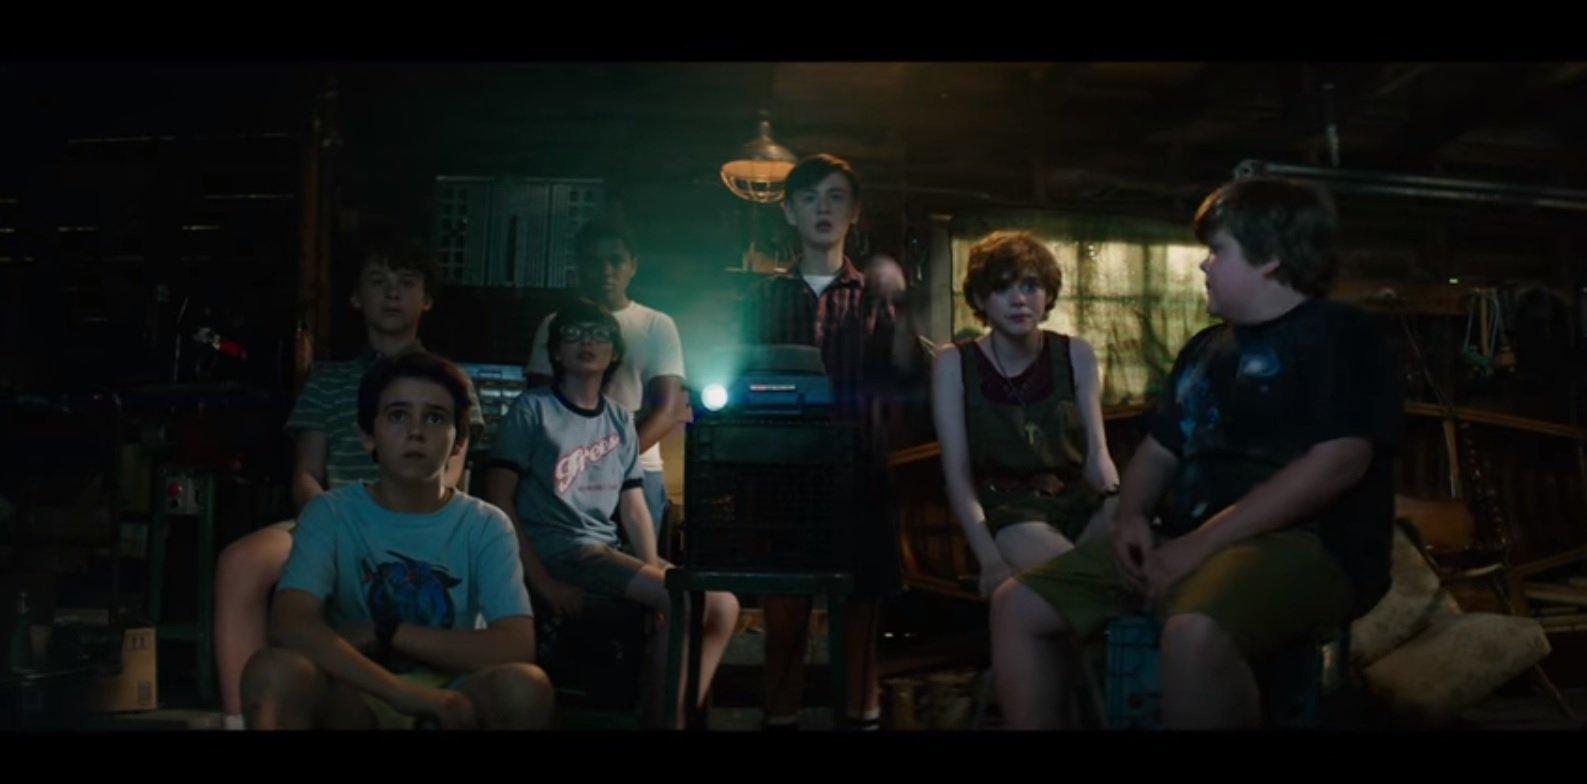 Кадр из фильма Оно